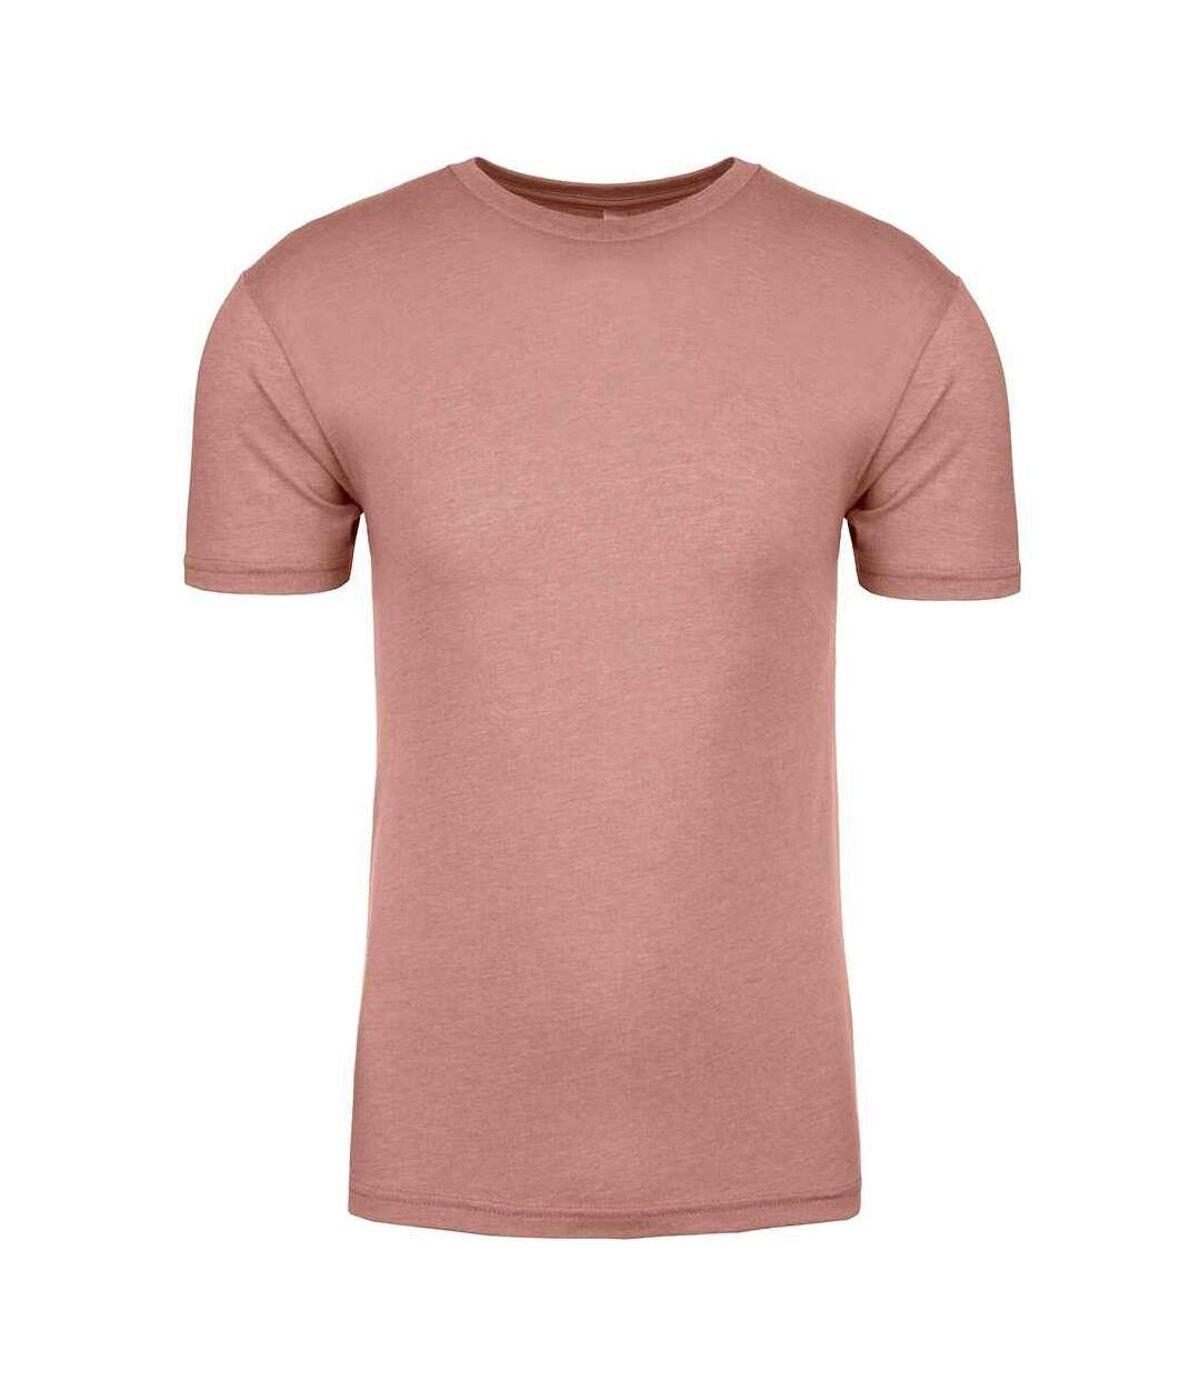 Next Level Mens Tri-Blend Crew Neck T-Shirt (Desert Pink) - UTPC3491